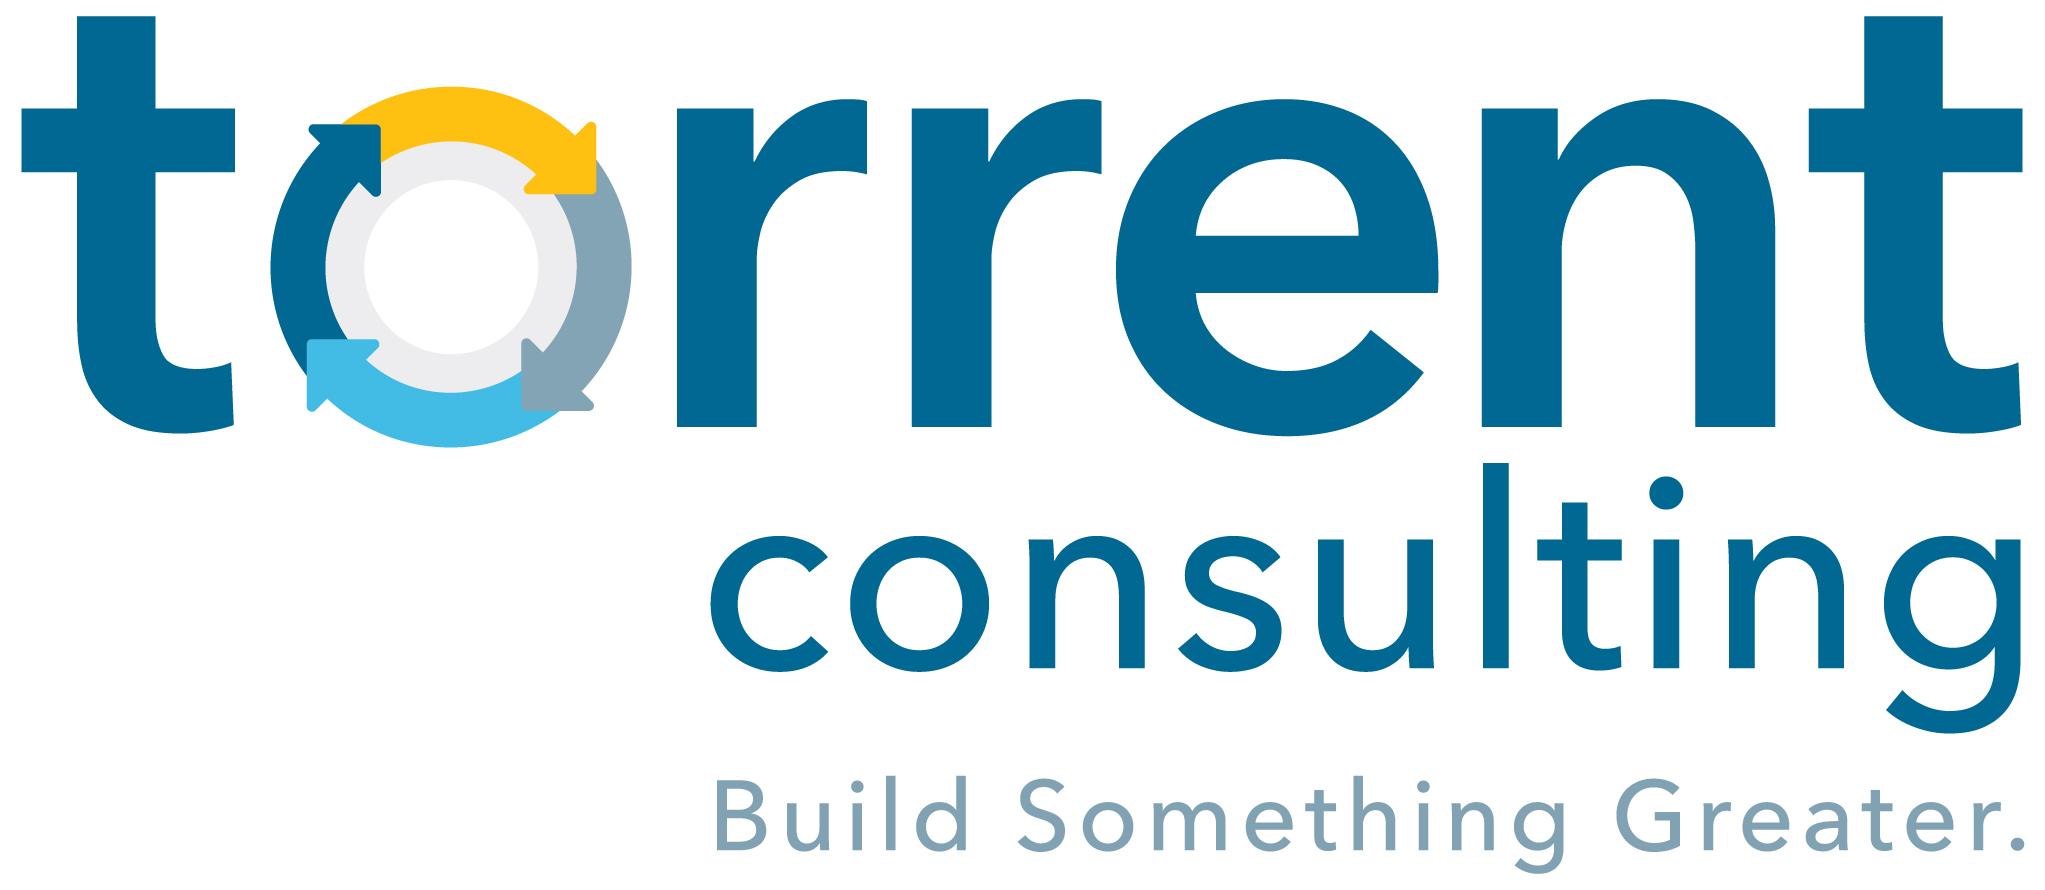 Torrent Consulting - Company Profile | TrueJob